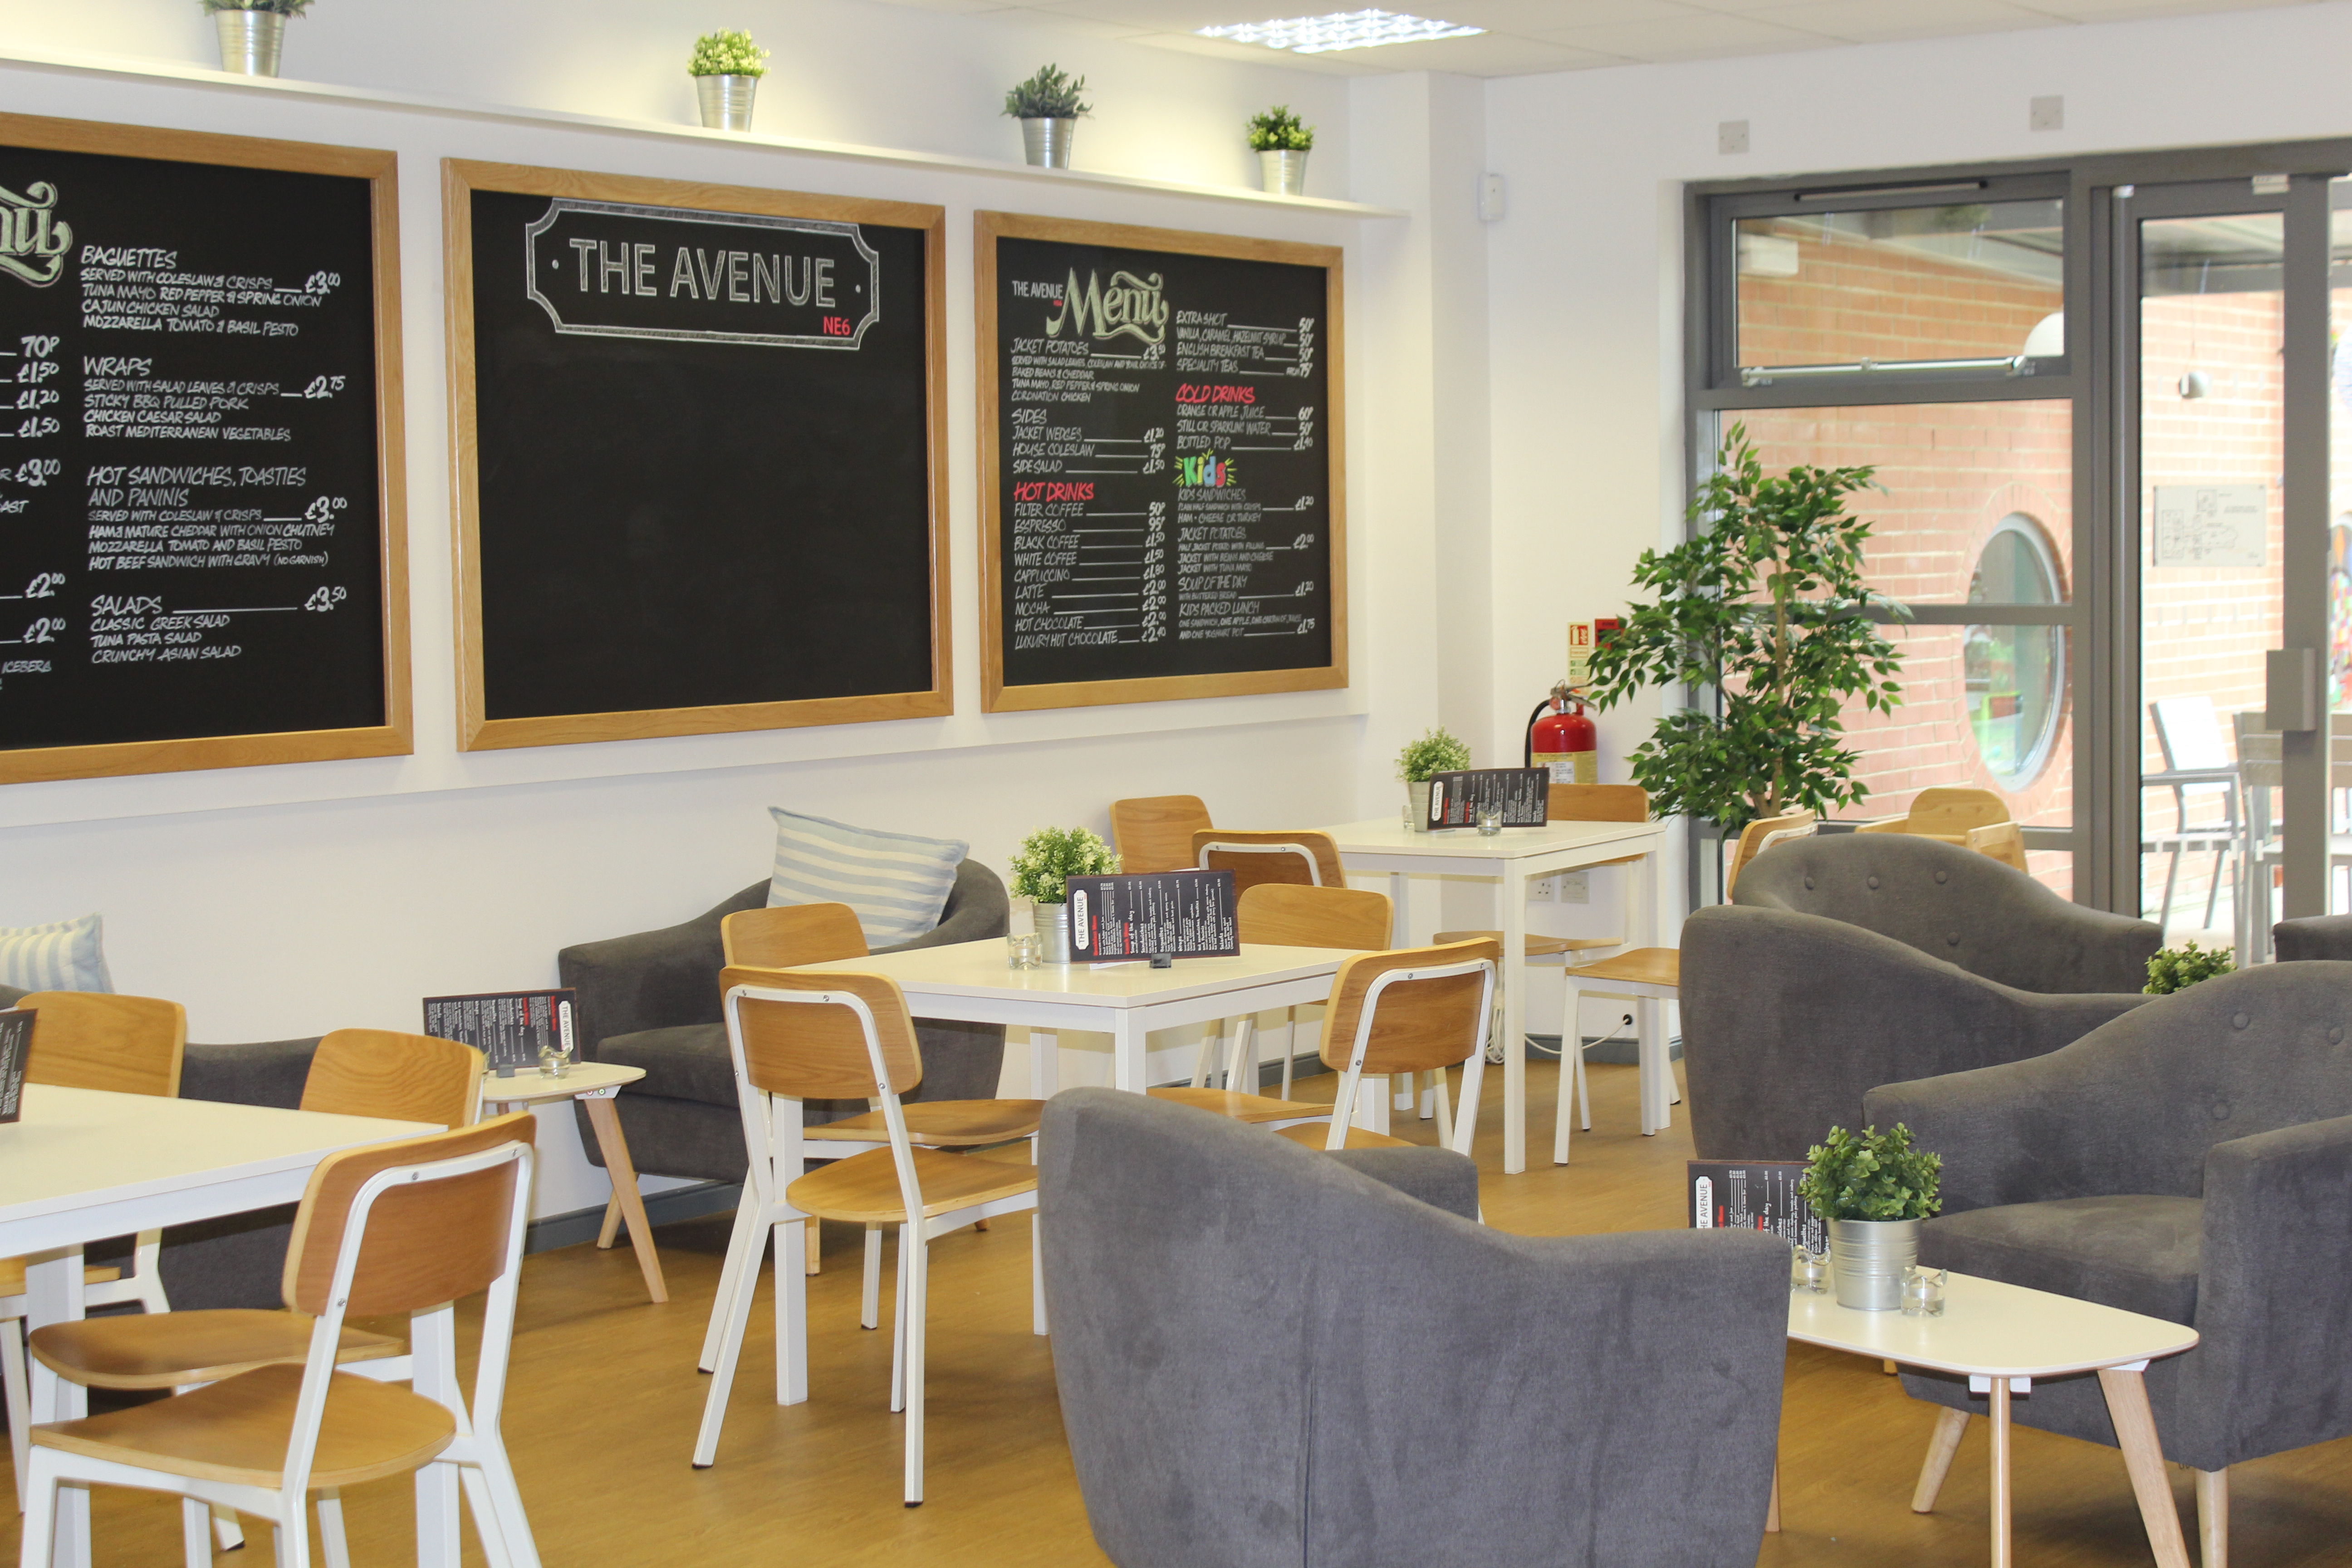 The Avenue Cafe St Martins Centre